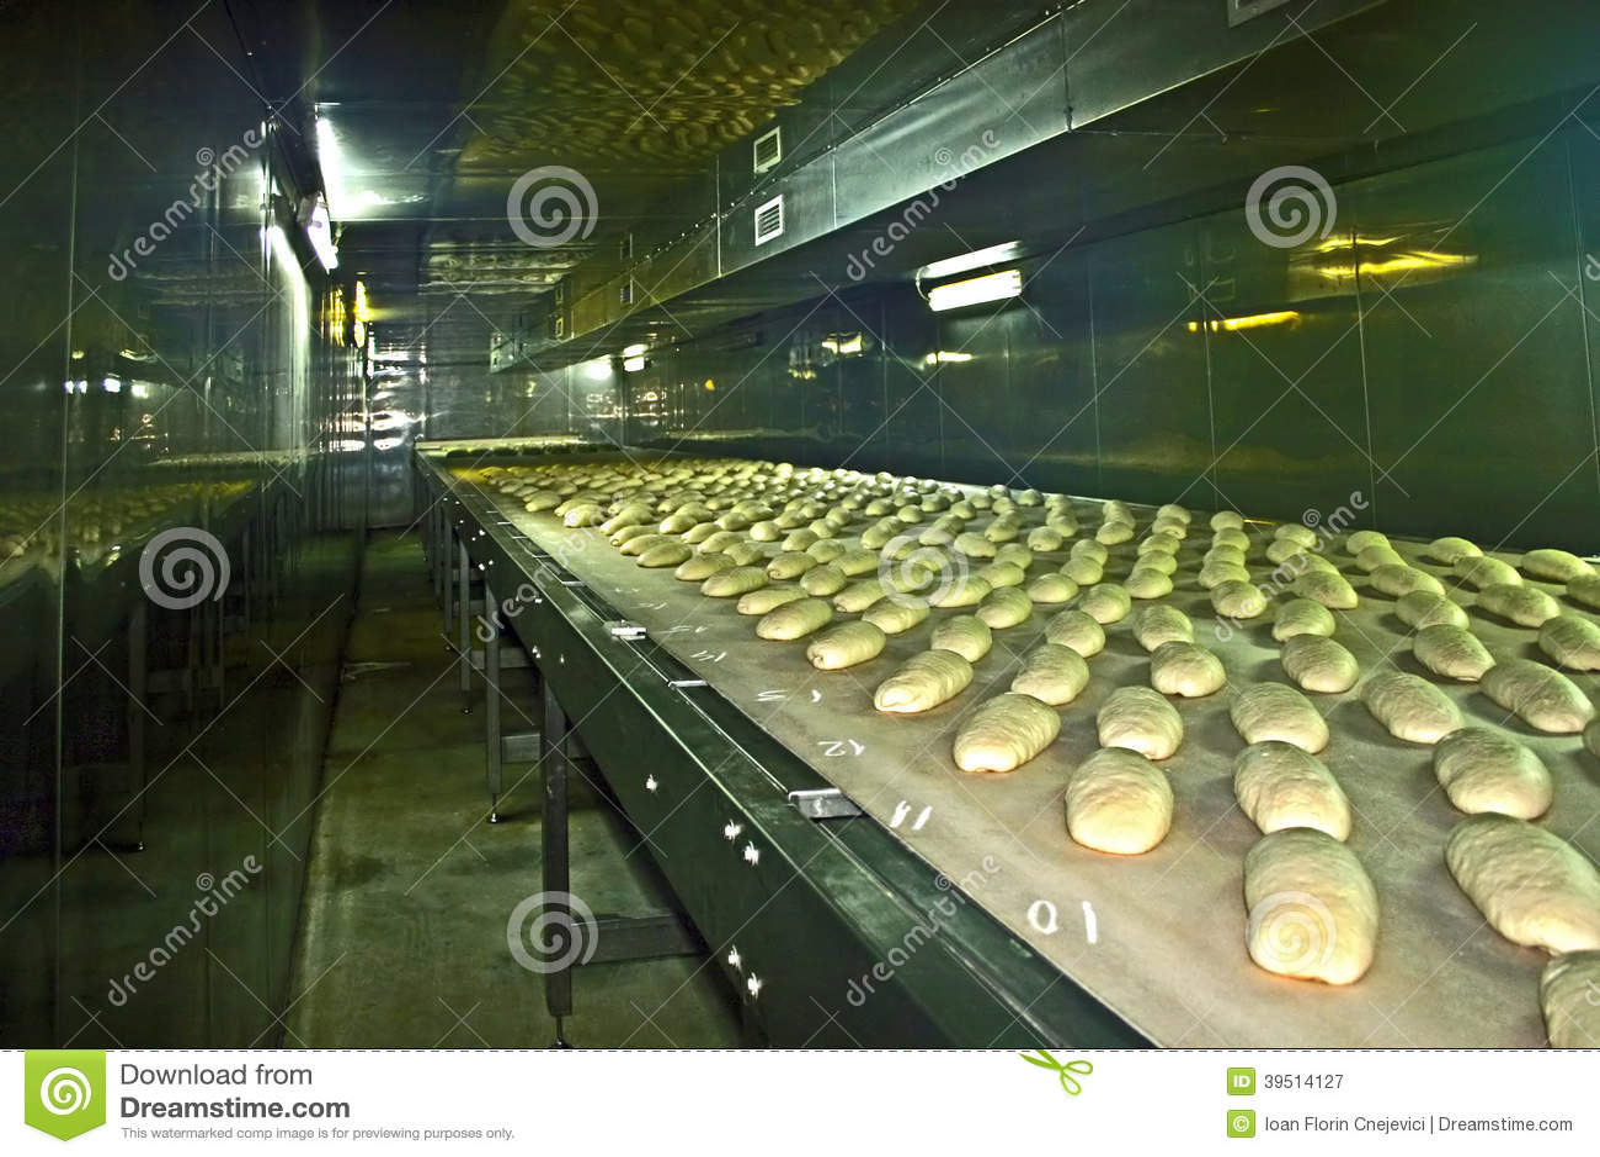 Bread production 1